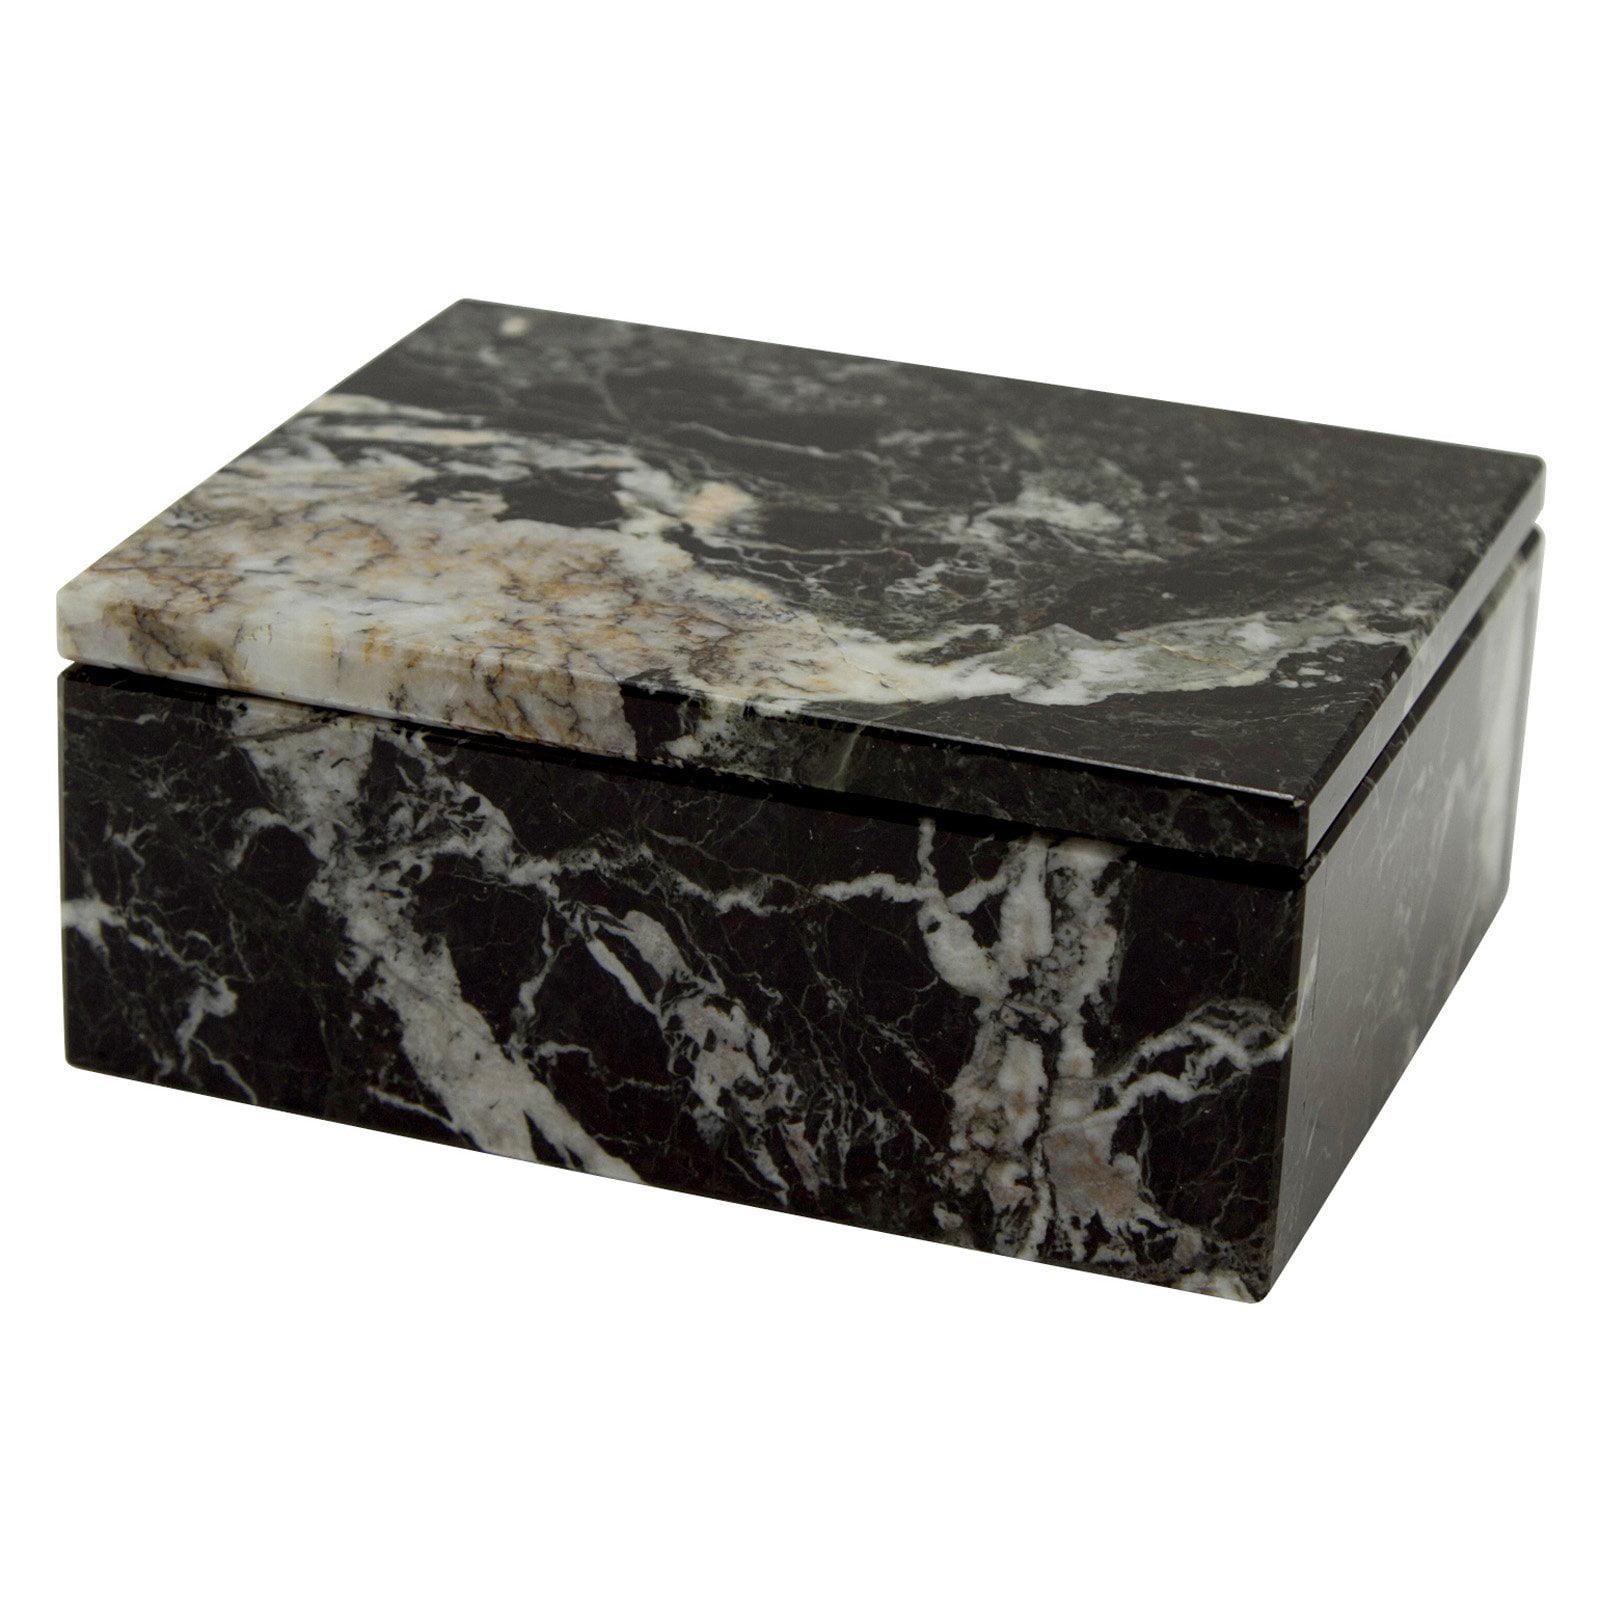 Asteria Keepsake Box - Black Zebra Marble - 5W x 2H in.